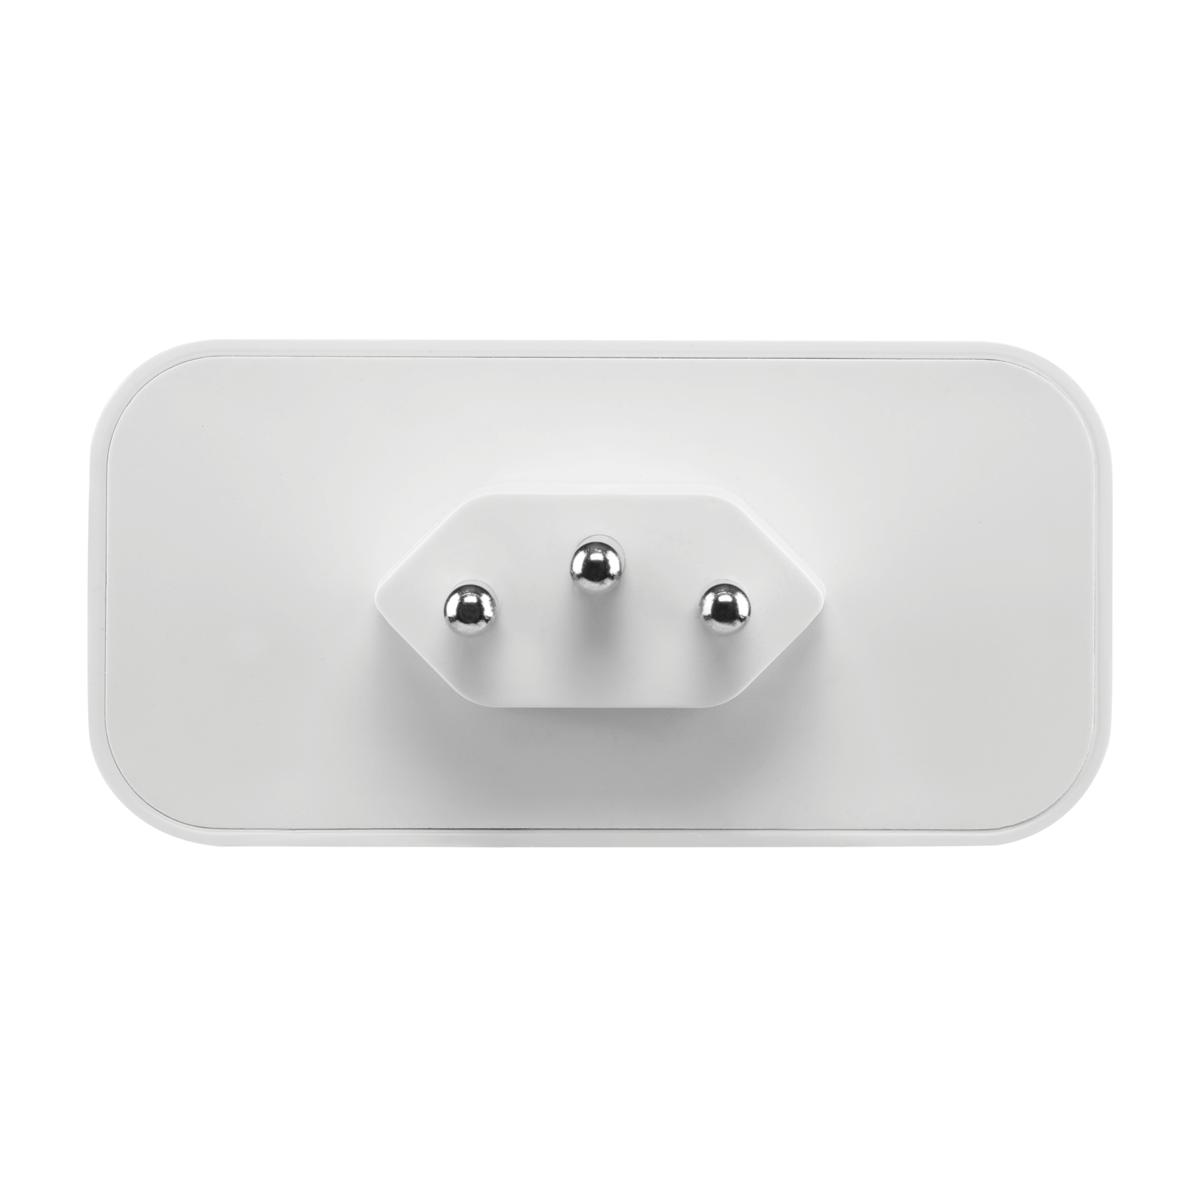 Conector Intelbras Smart Wi-Fi Universal EWS 301